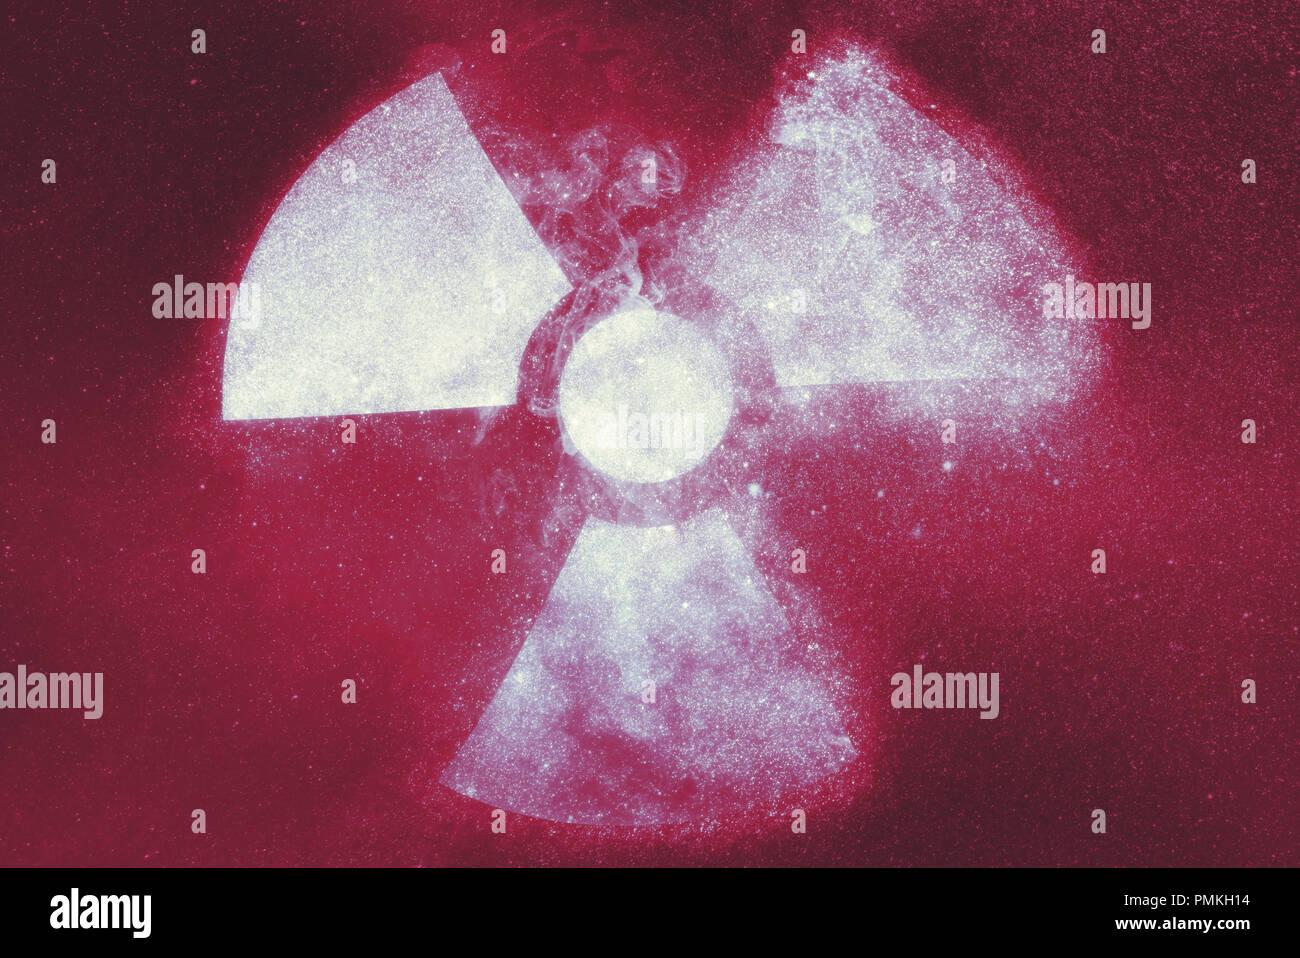 Radiation sign, Radiation symbol. Abstract background Stock Photo